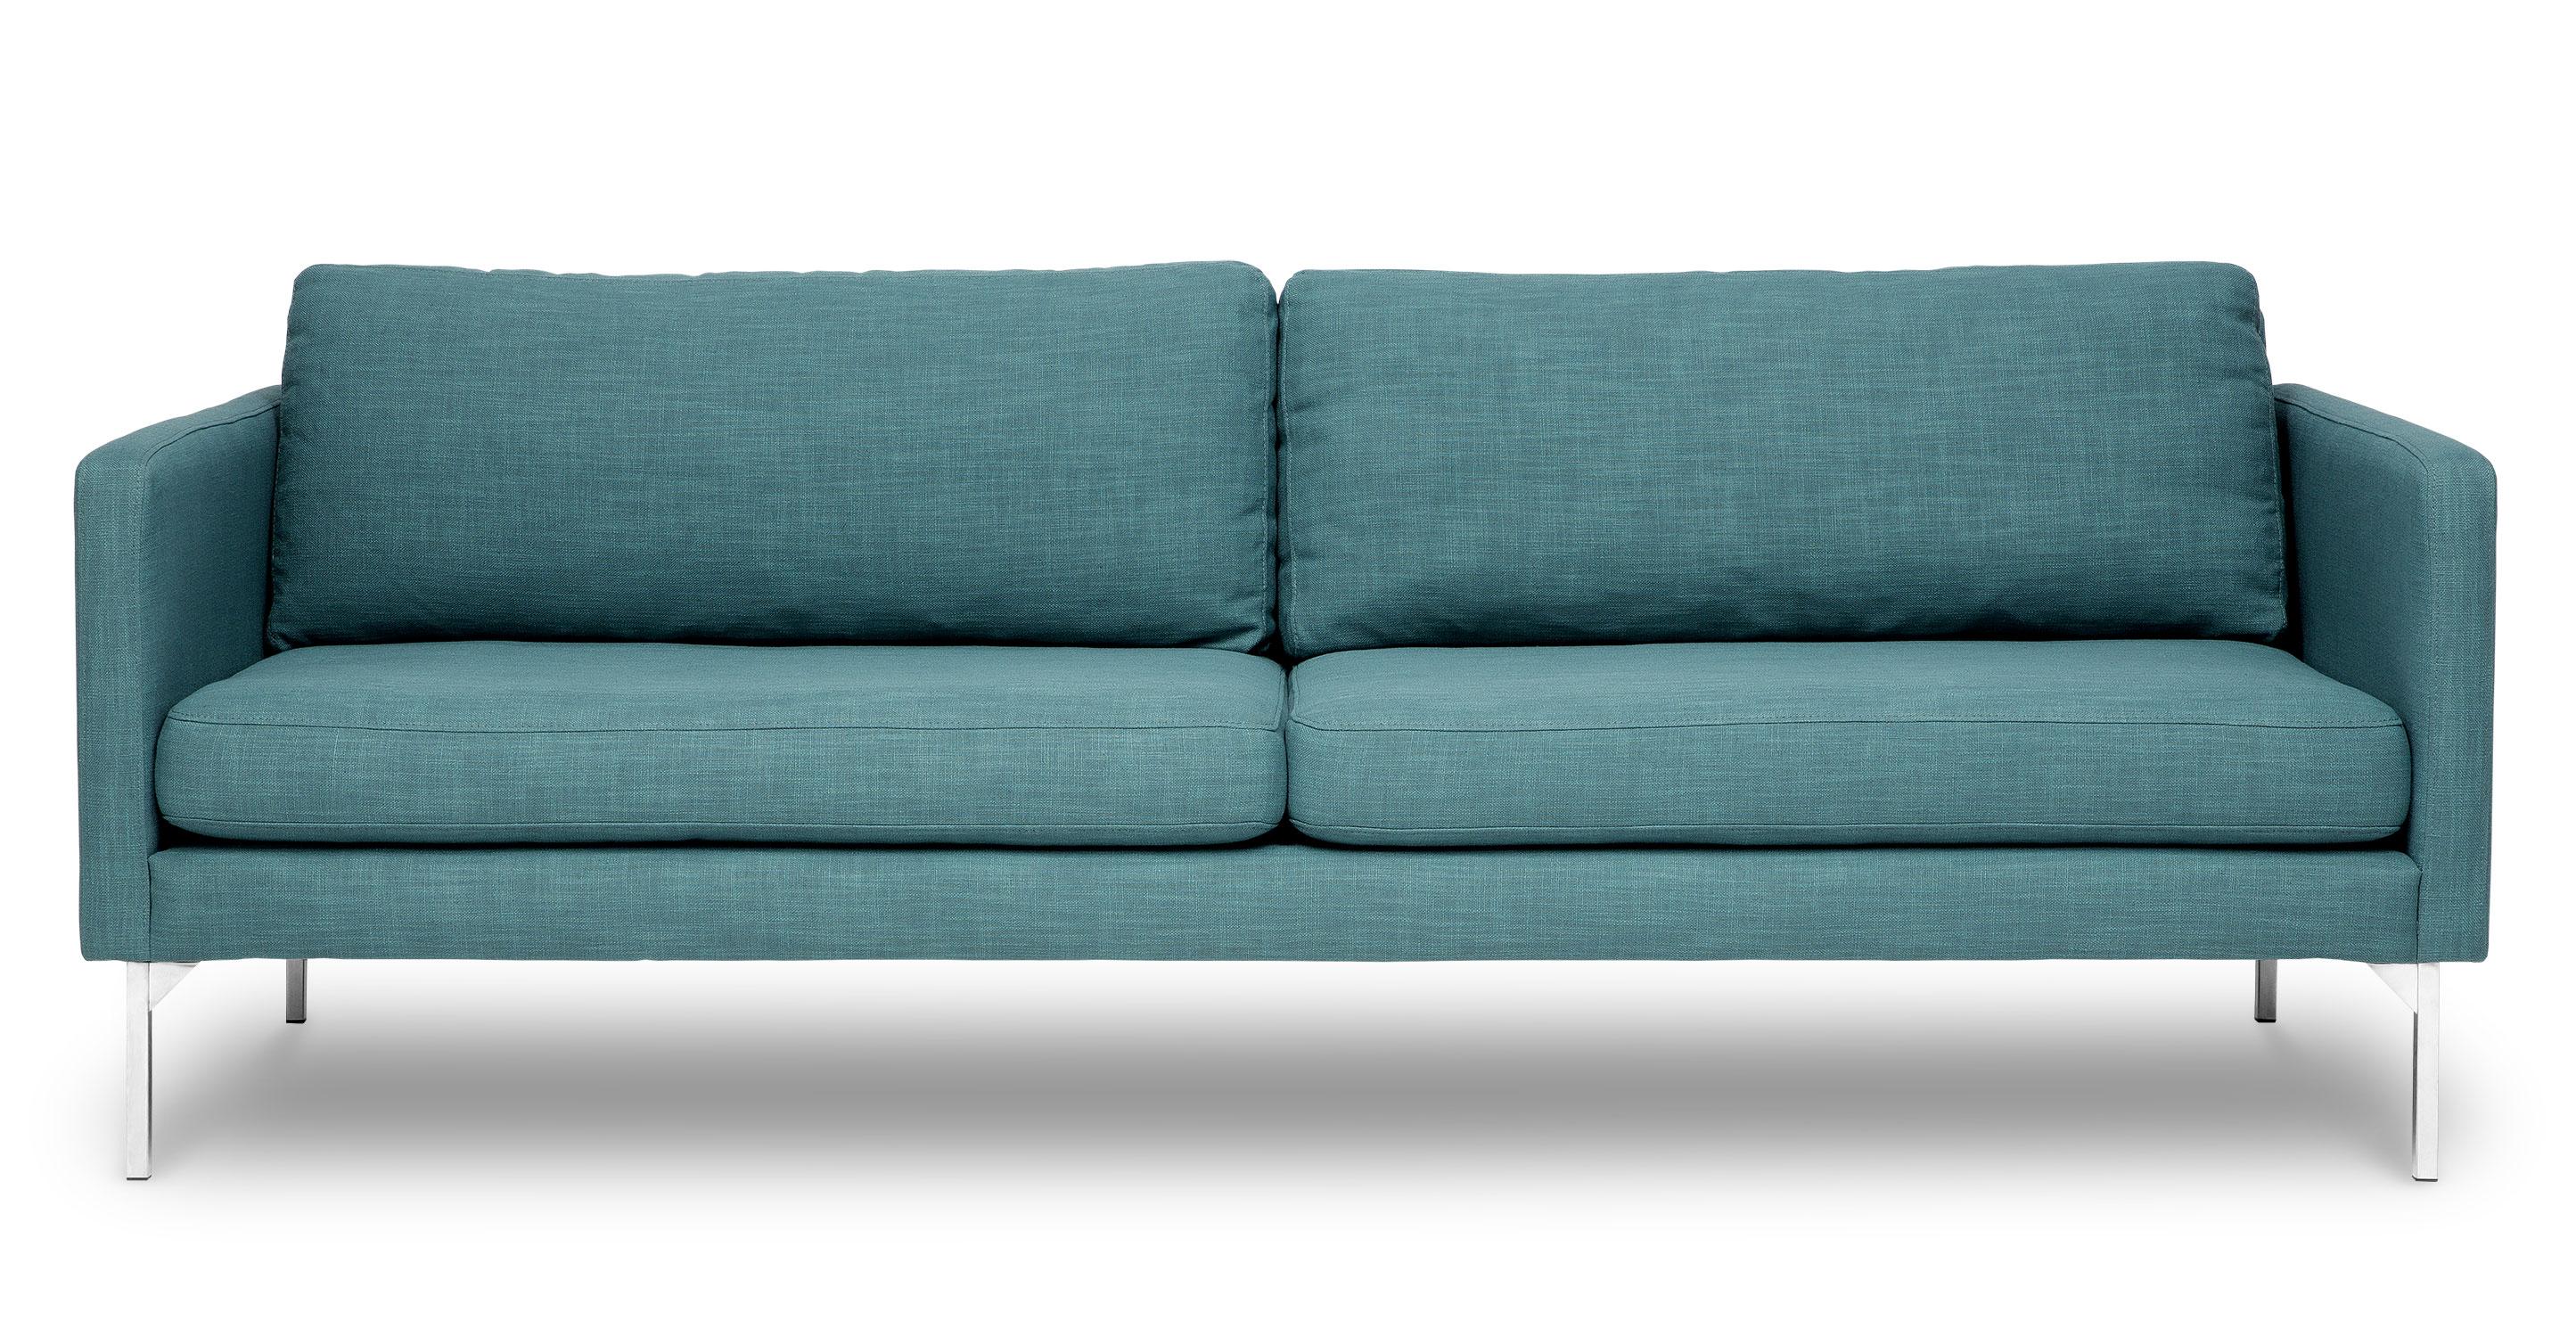 sofa article xv convertible bed pozzi echo blue spruce sofas modern mid